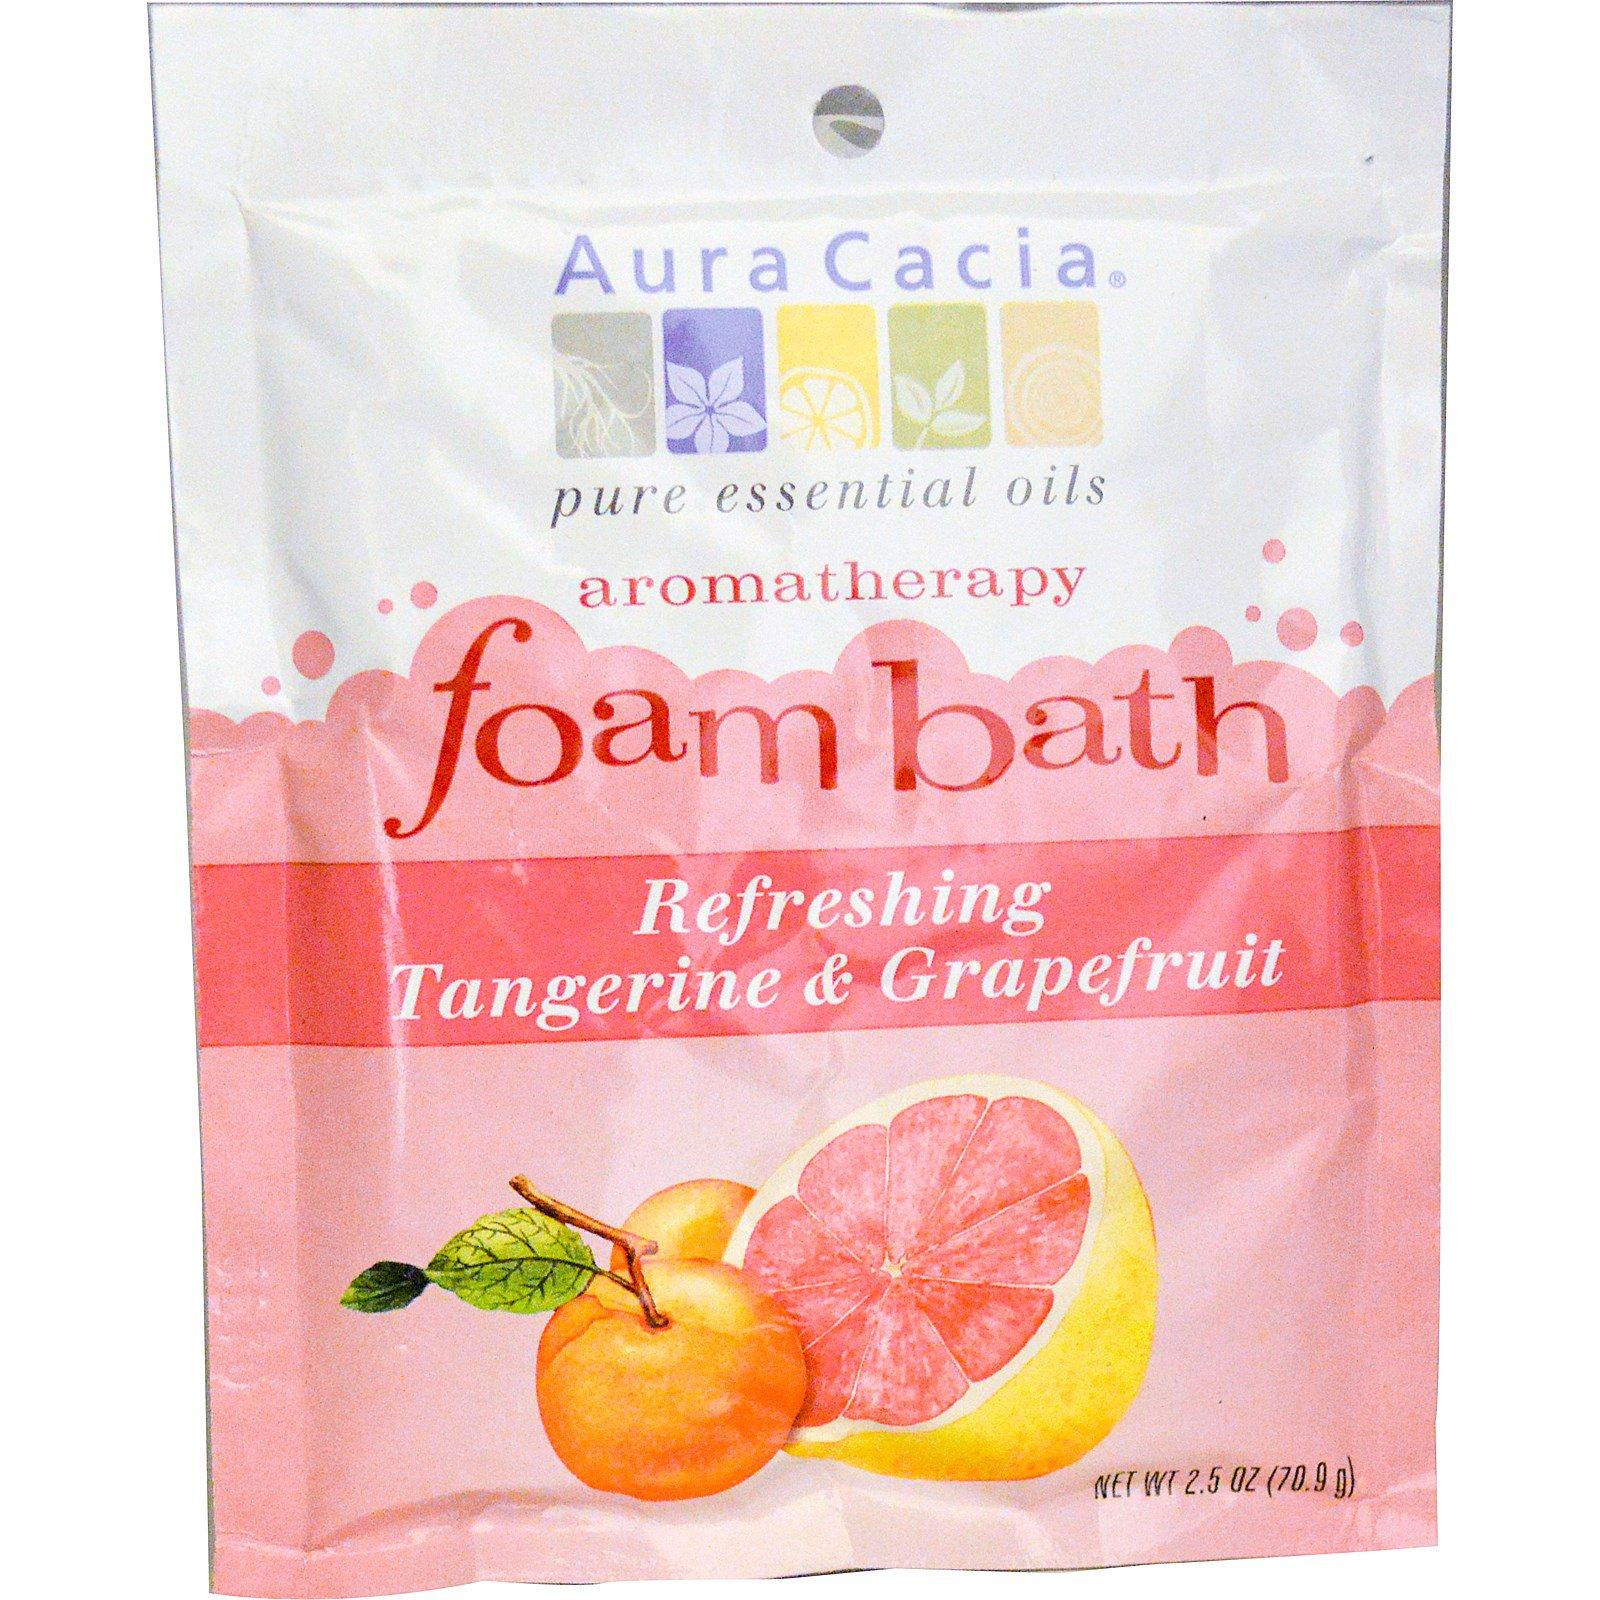 Aura Cacia, Пена-ароматерапия для ванн, освежающий мандарин и грейпфрут 2.5 унции (70.9 г)